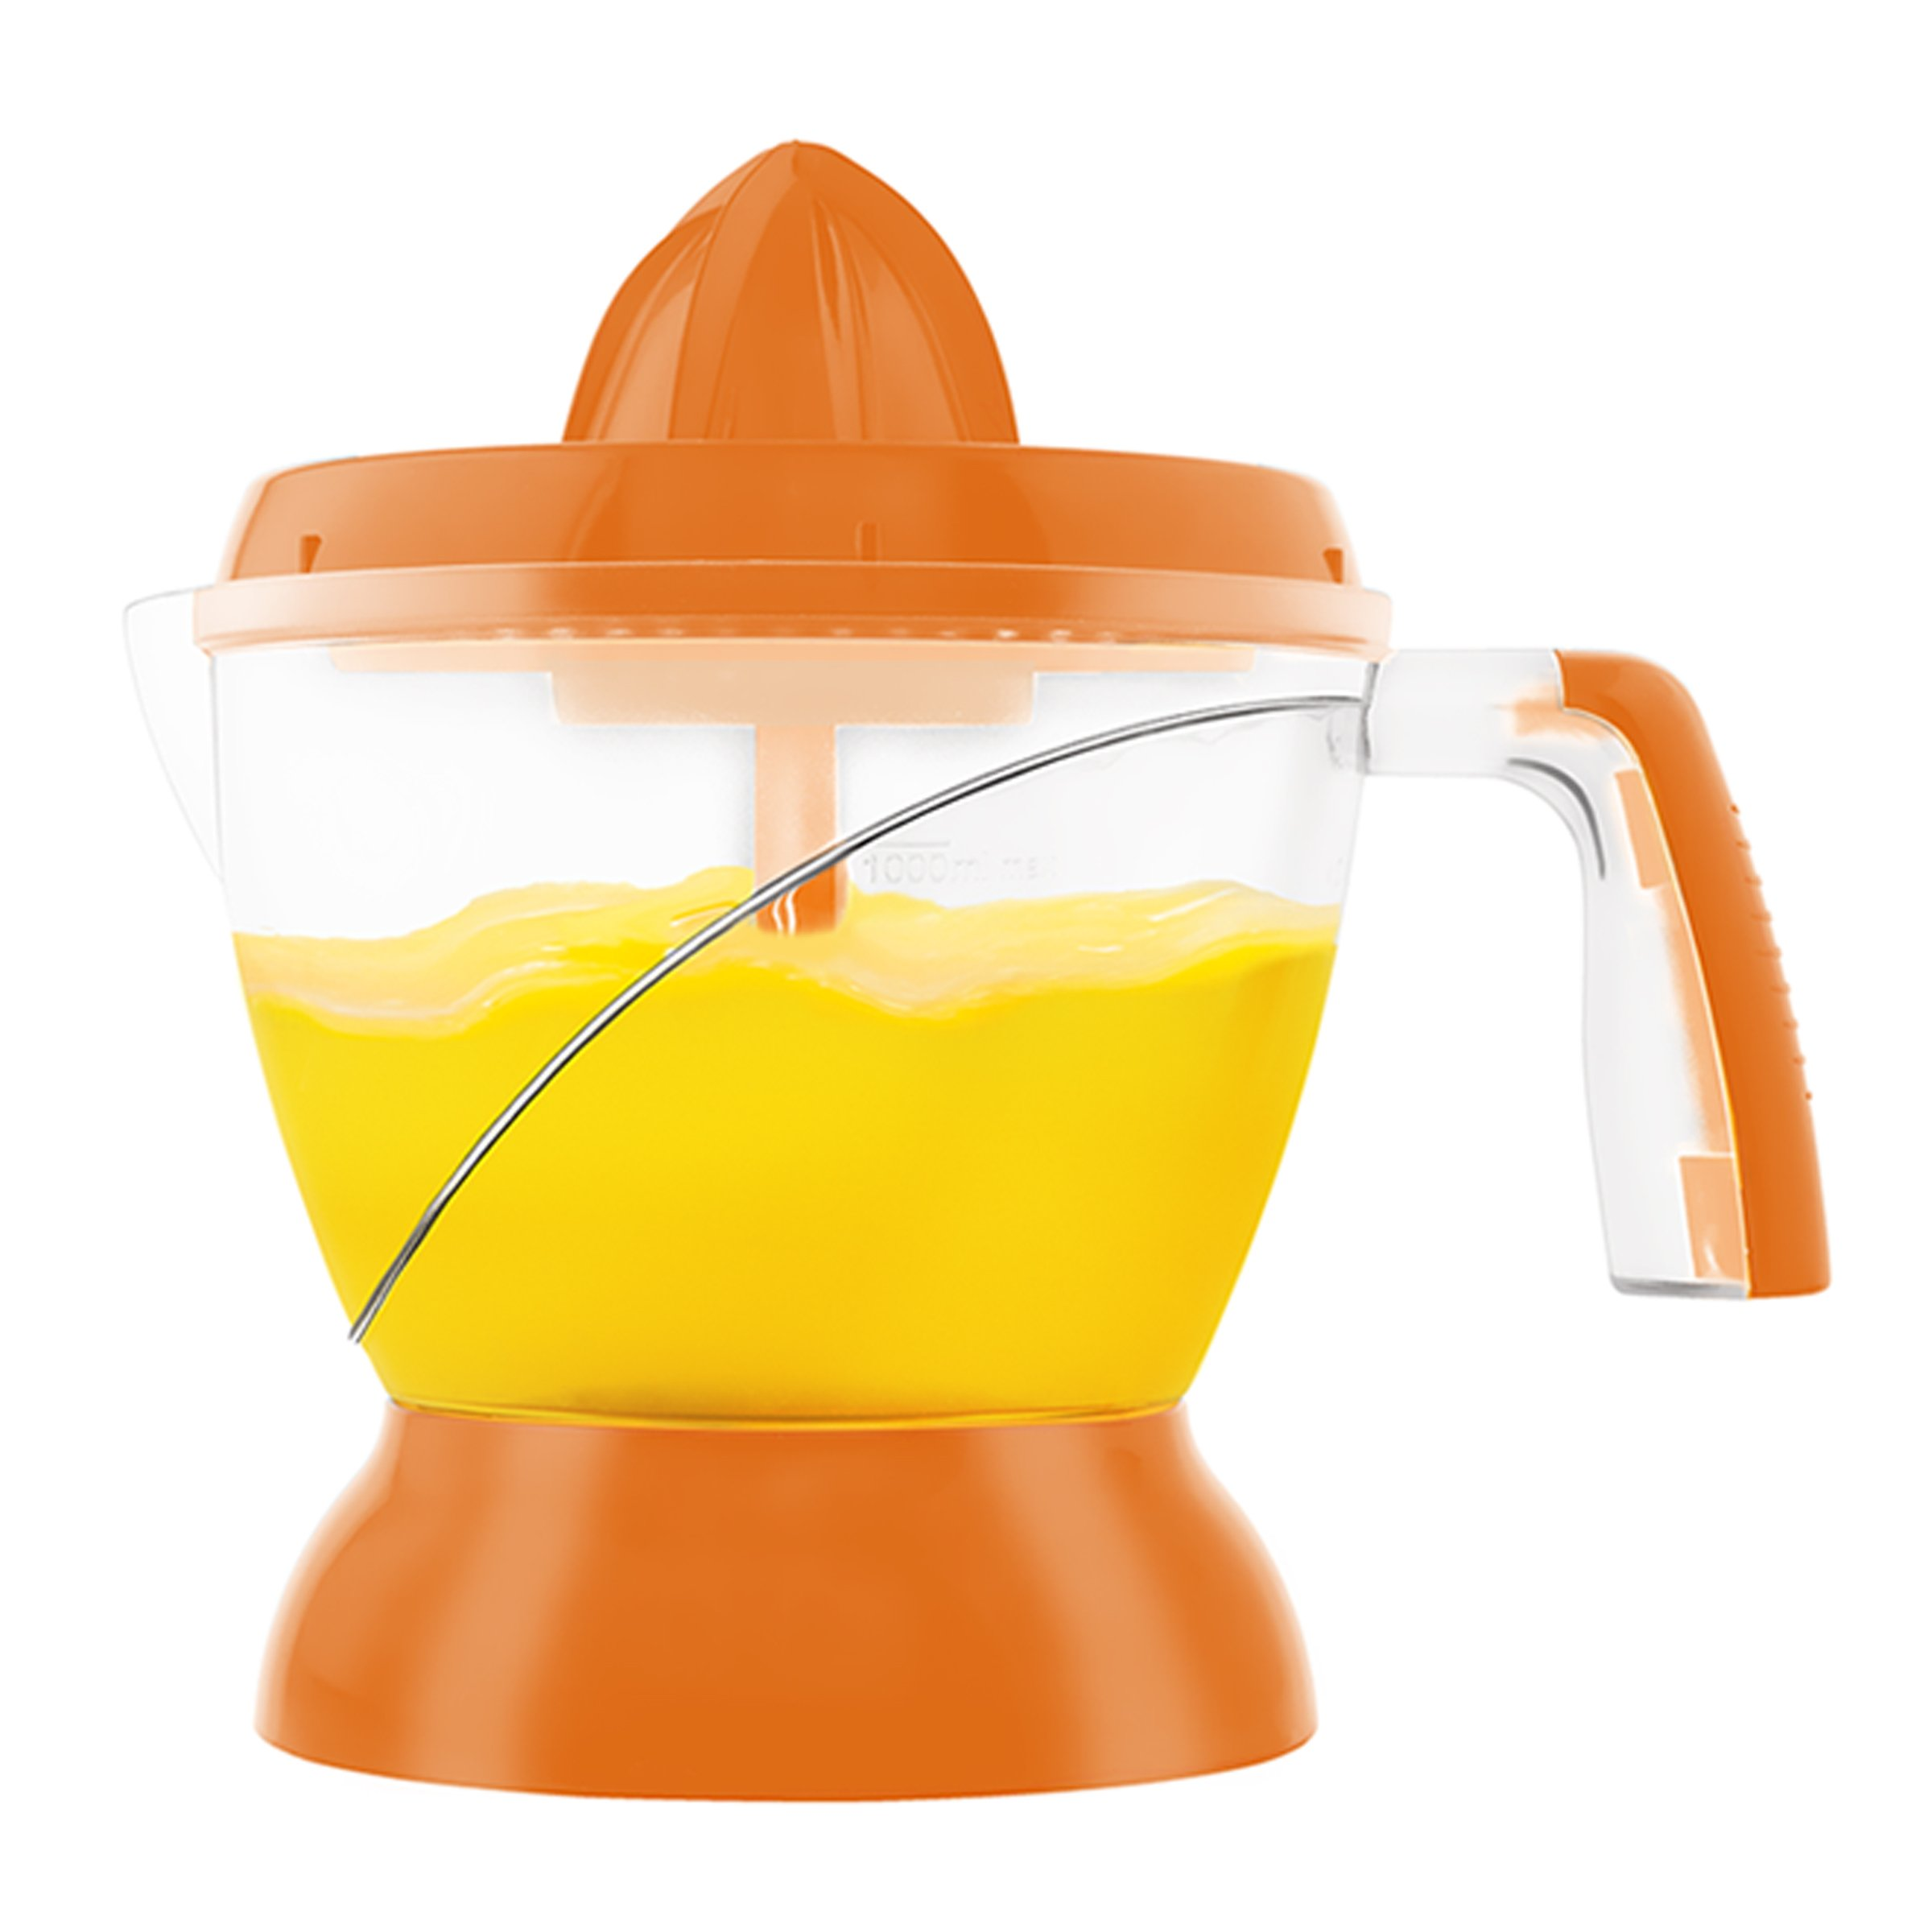 Big Boss 9090 Electric Citrus Juicer, Orange